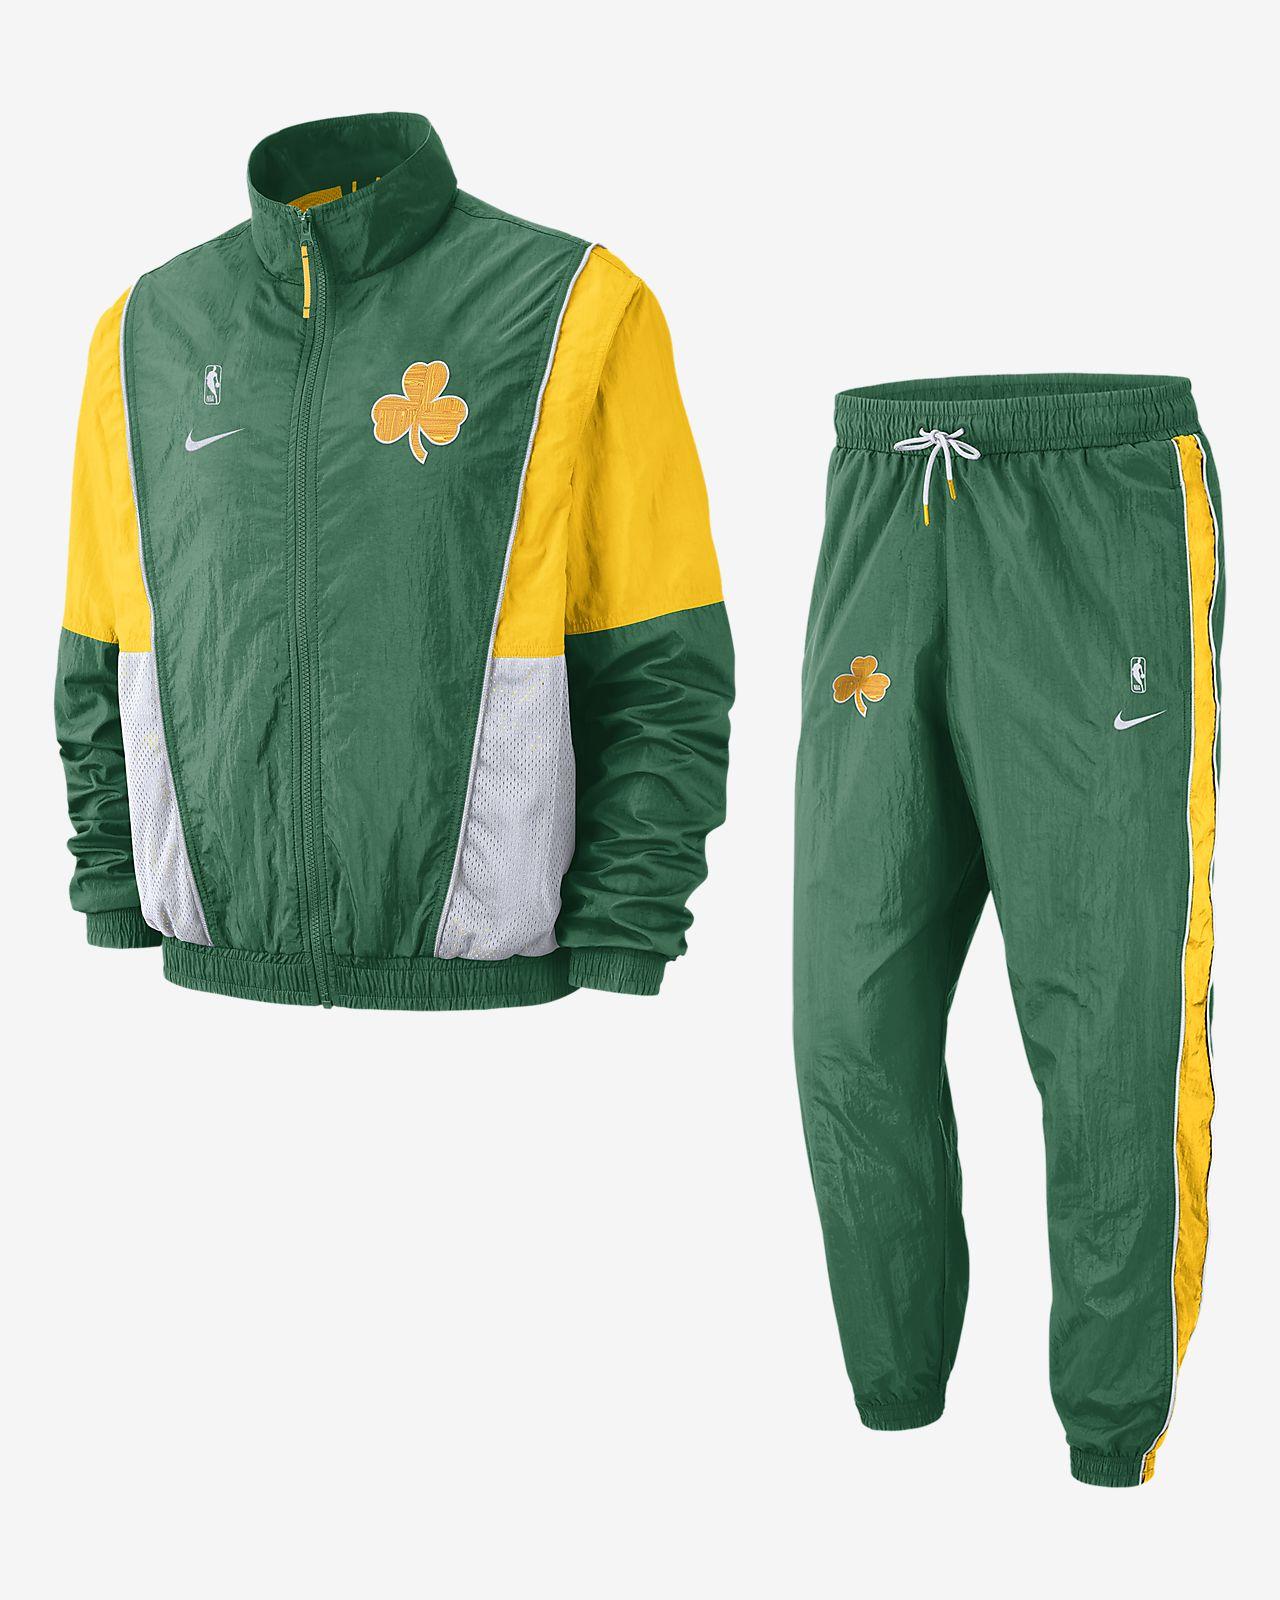 Boston Celtics Nike Chándal de la NBA - Hombre